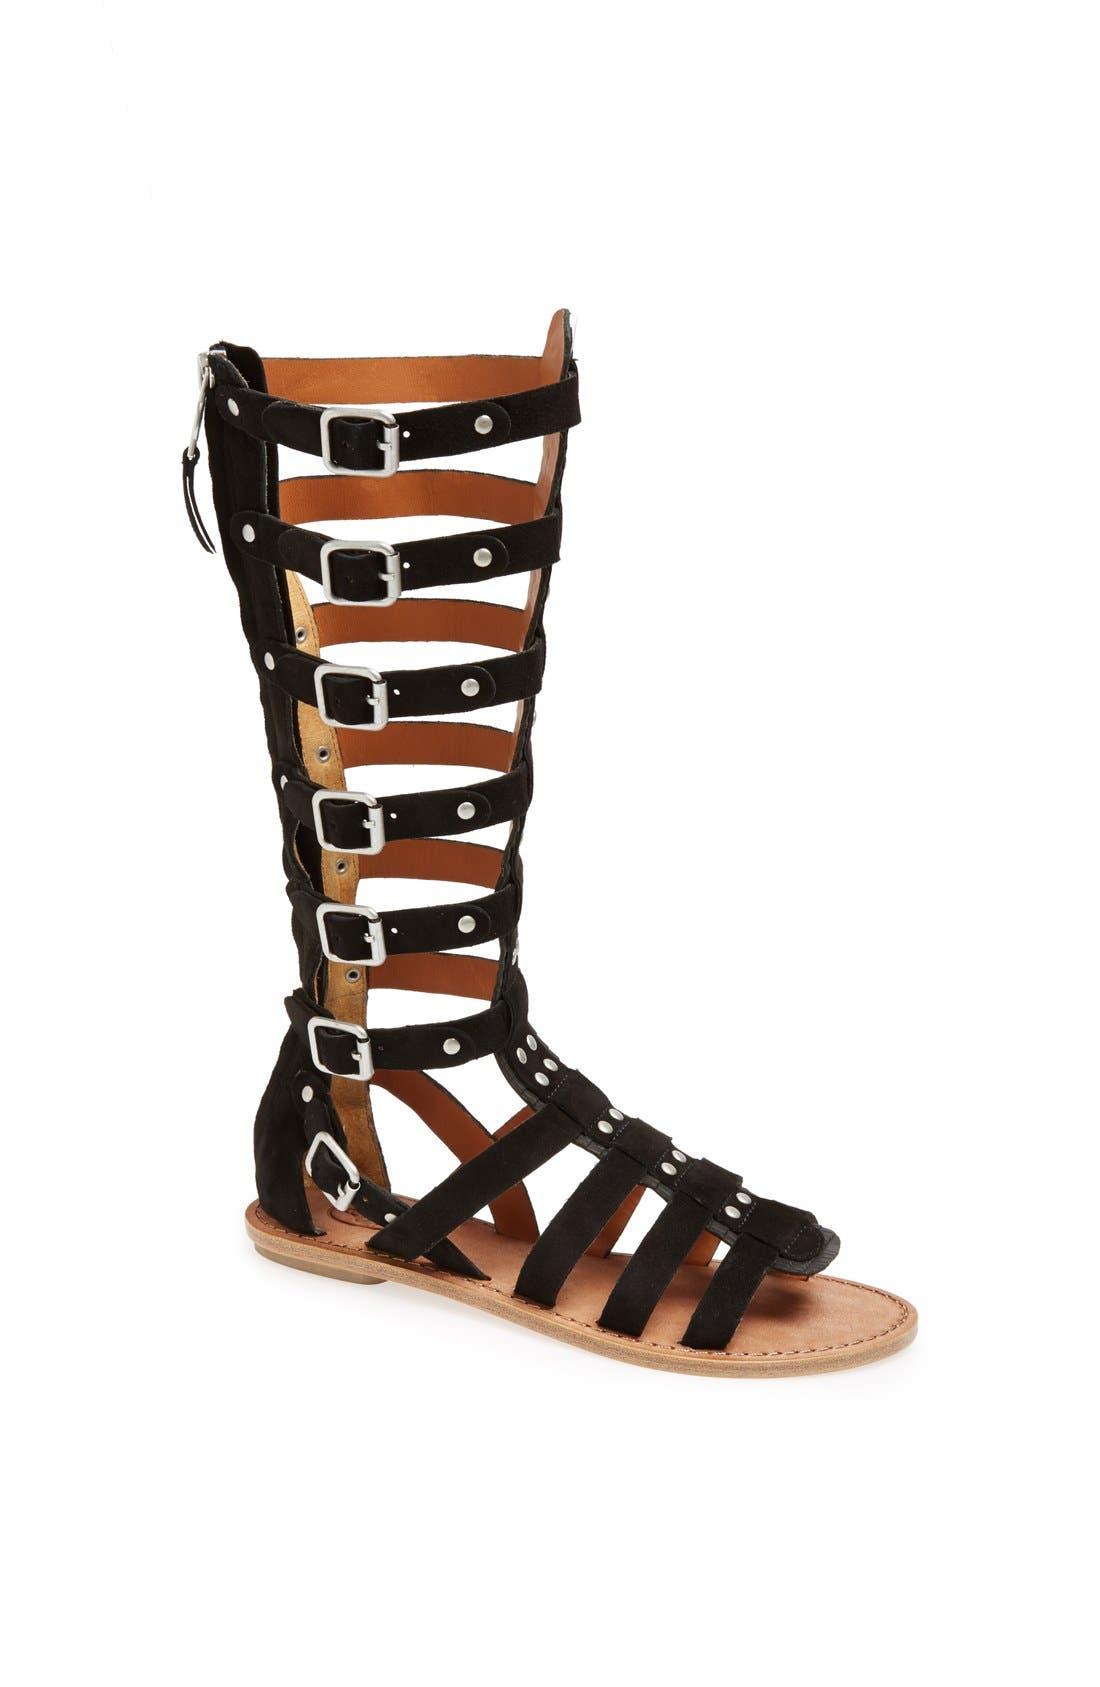 Alternate Image 1 Selected - Ash 'Nyphea' Gladiator Sandal